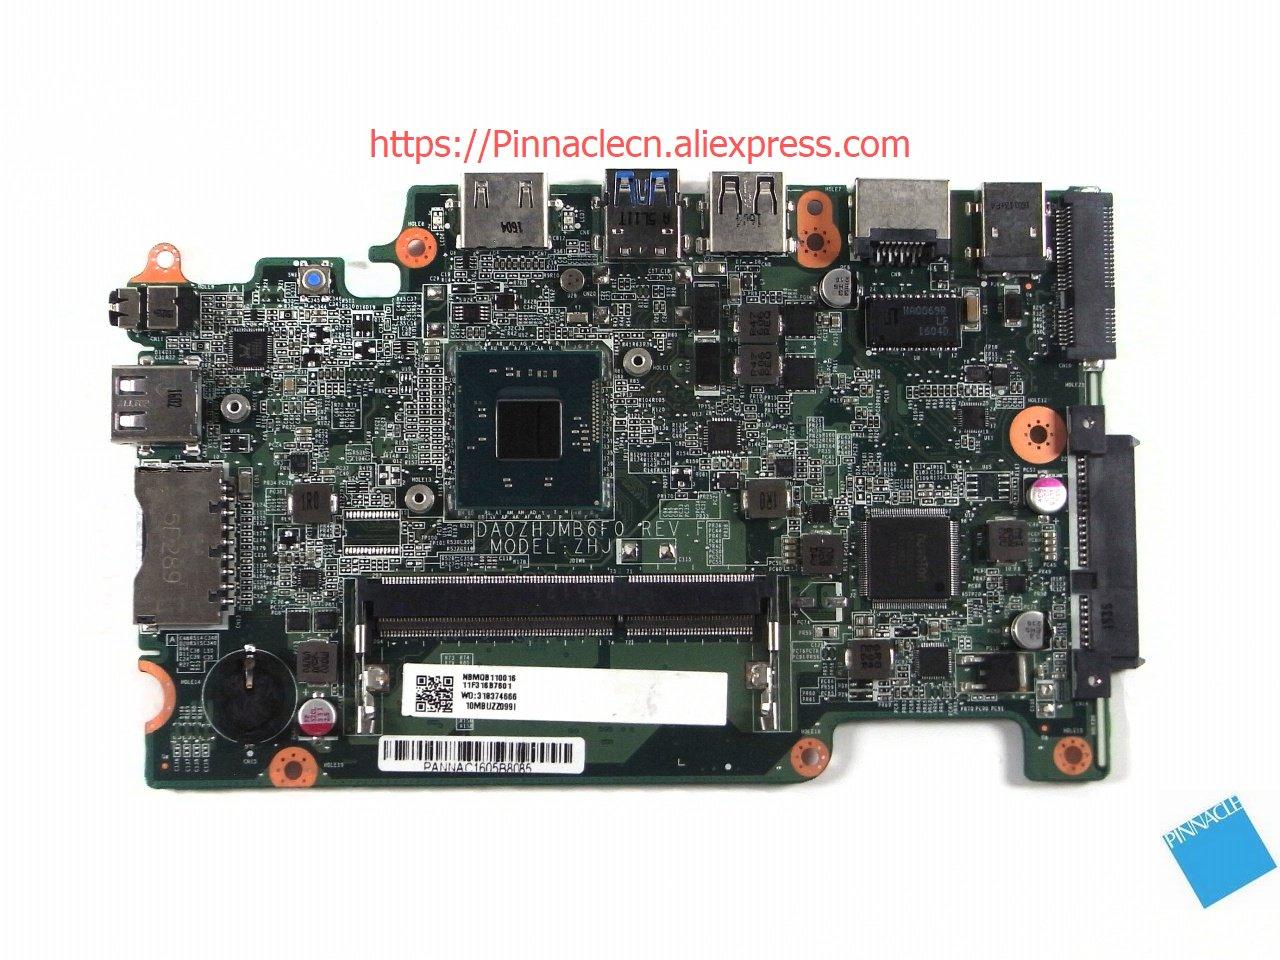 NBMQB11001 Motherboard for Acer Aspire E3-111 TravelMate B115-M B115-MP DA0ZHJMB6F0 ZHJ kingsener new ac14b18j battery for acer aspire e3 111 e3 112 e3 112m es1 511 v3 111p cb3 531 travelmate b115 m b115 mp ac14b8k